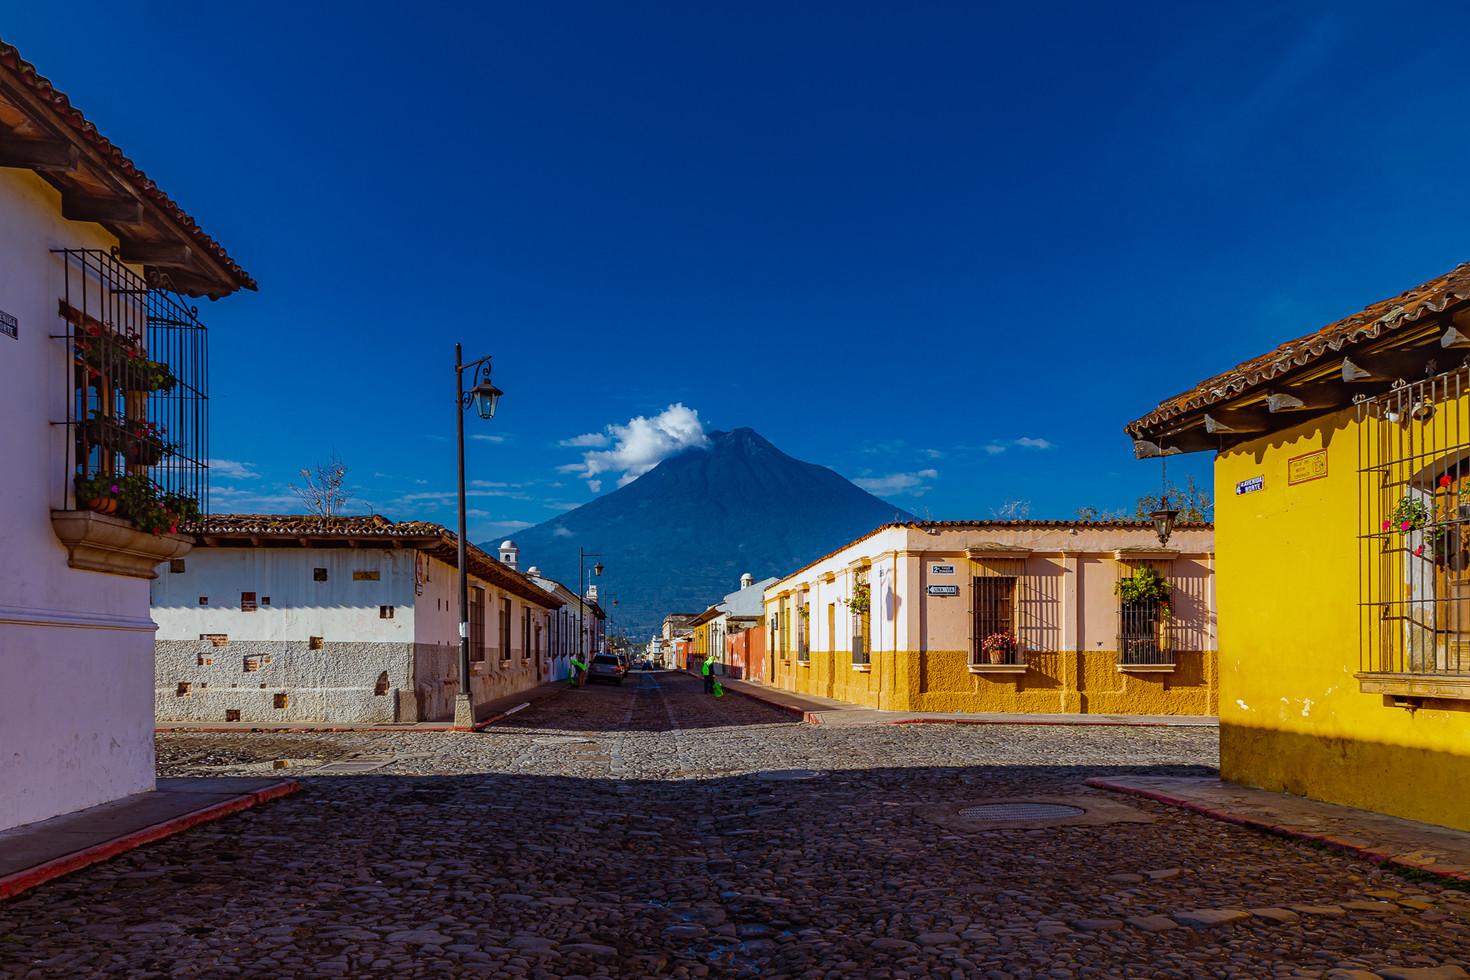 TKPA-Antigua201805-0148-HDWH.jpg